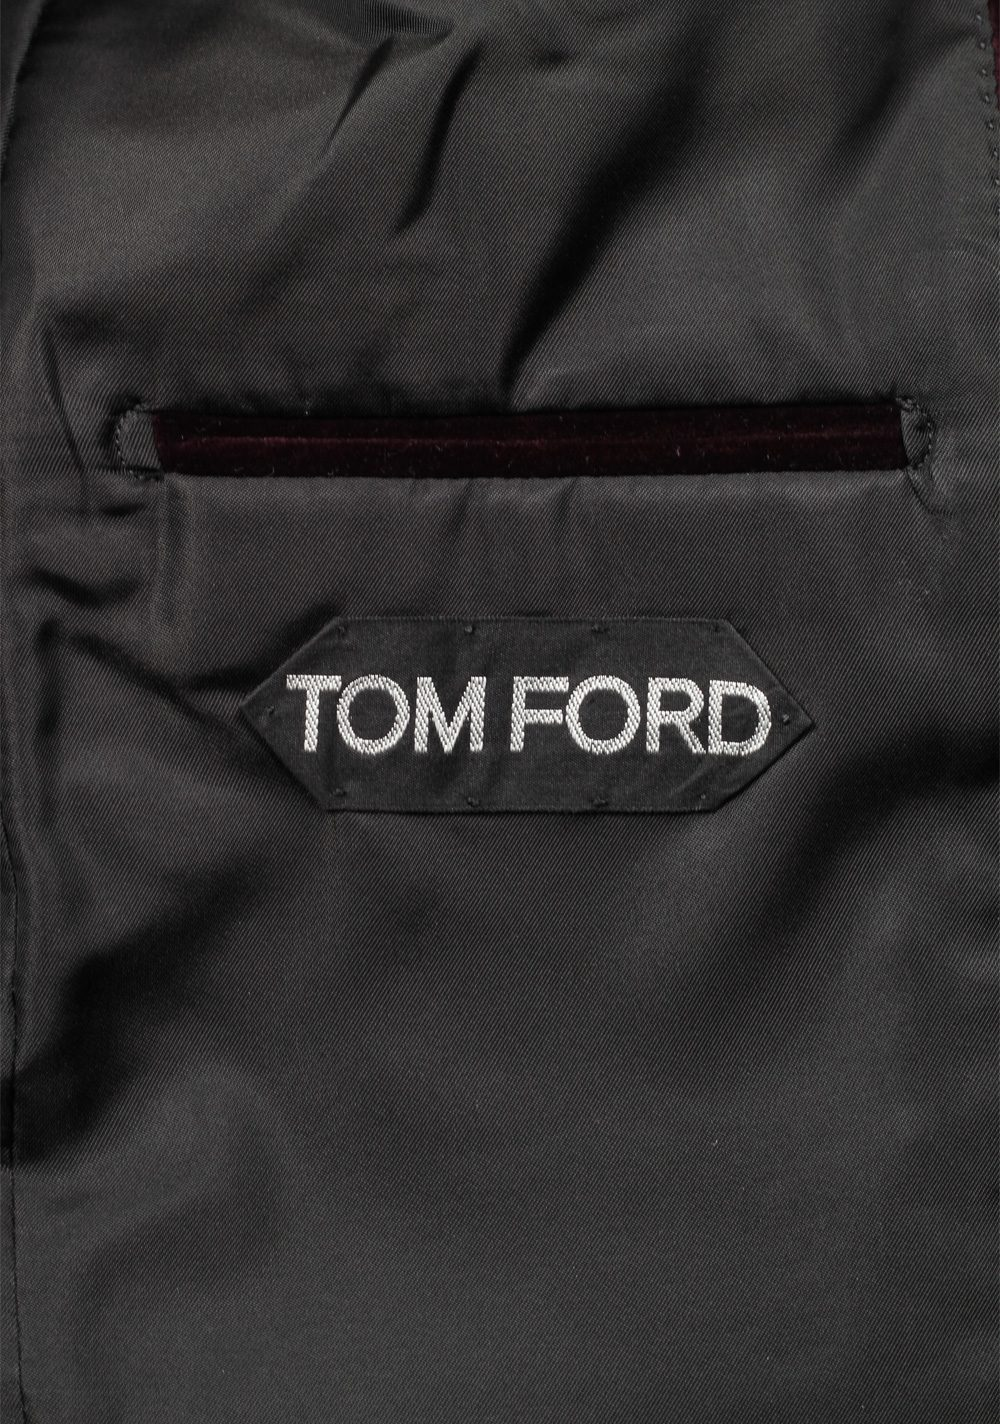 TOM FORD Shelton Aubergine Velvet Sport Coat Size 50 / 40R U.S. | Costume Limité